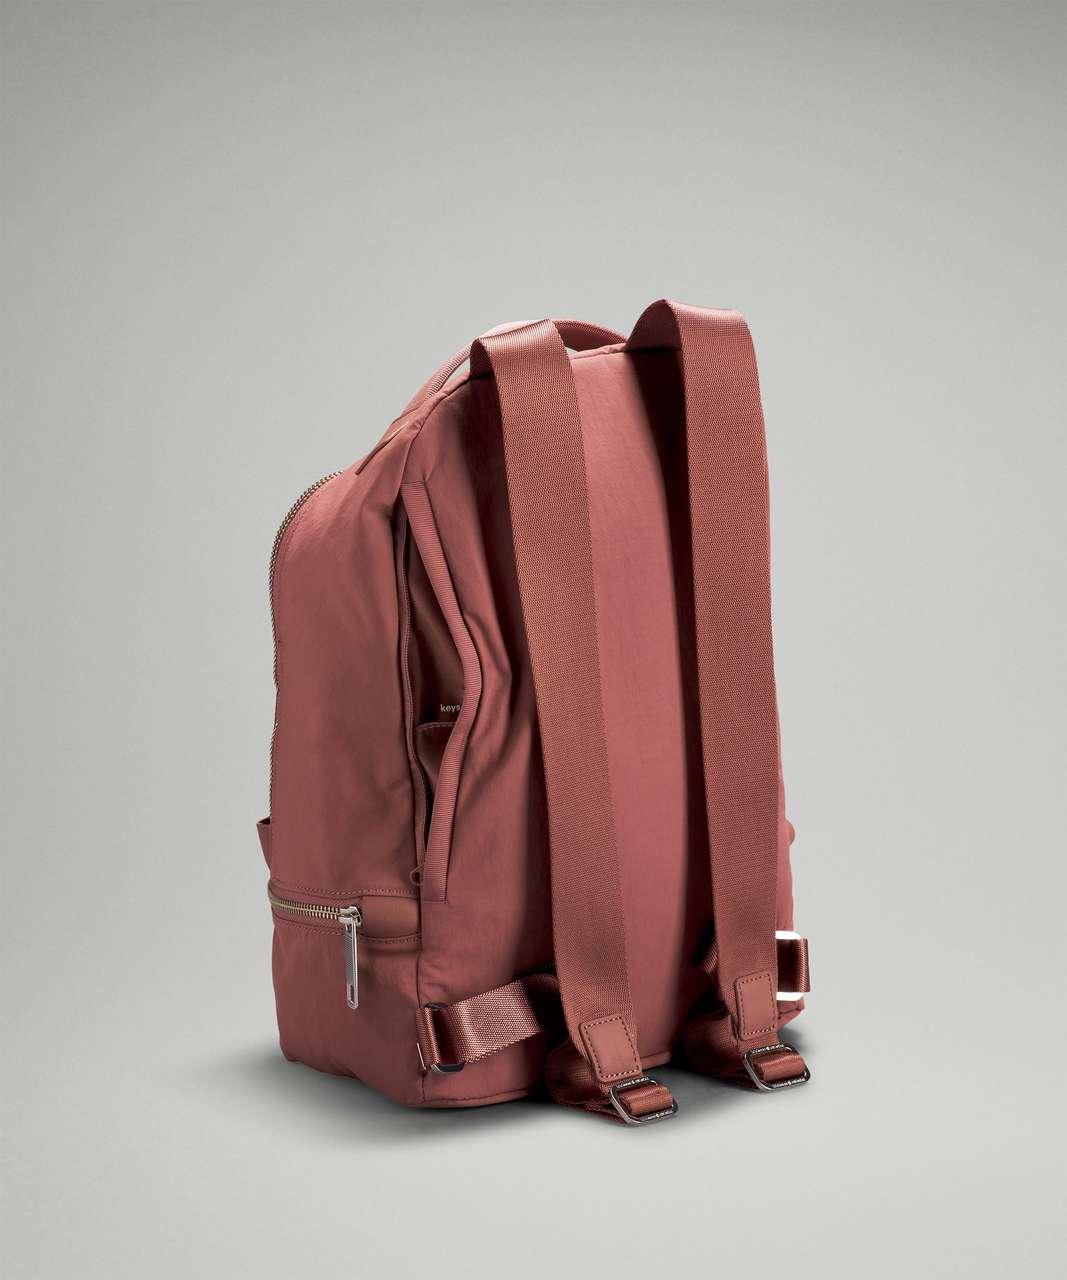 Lululemon City Adventurer Backpack *Mini 10L - Spiced Chai